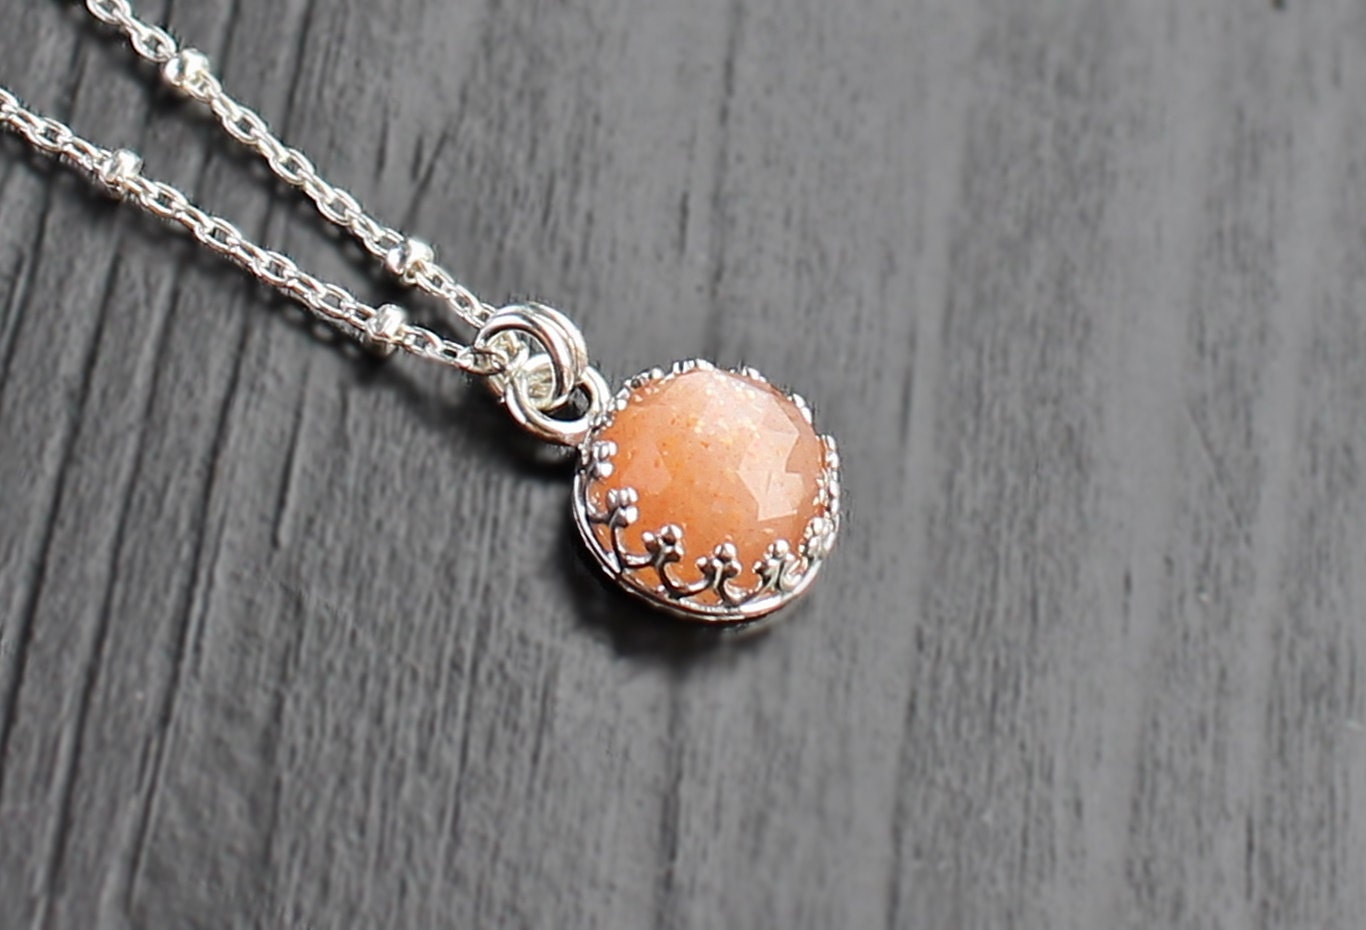 Peach Moonstone Necklace moonstone bezel necklace 8mm